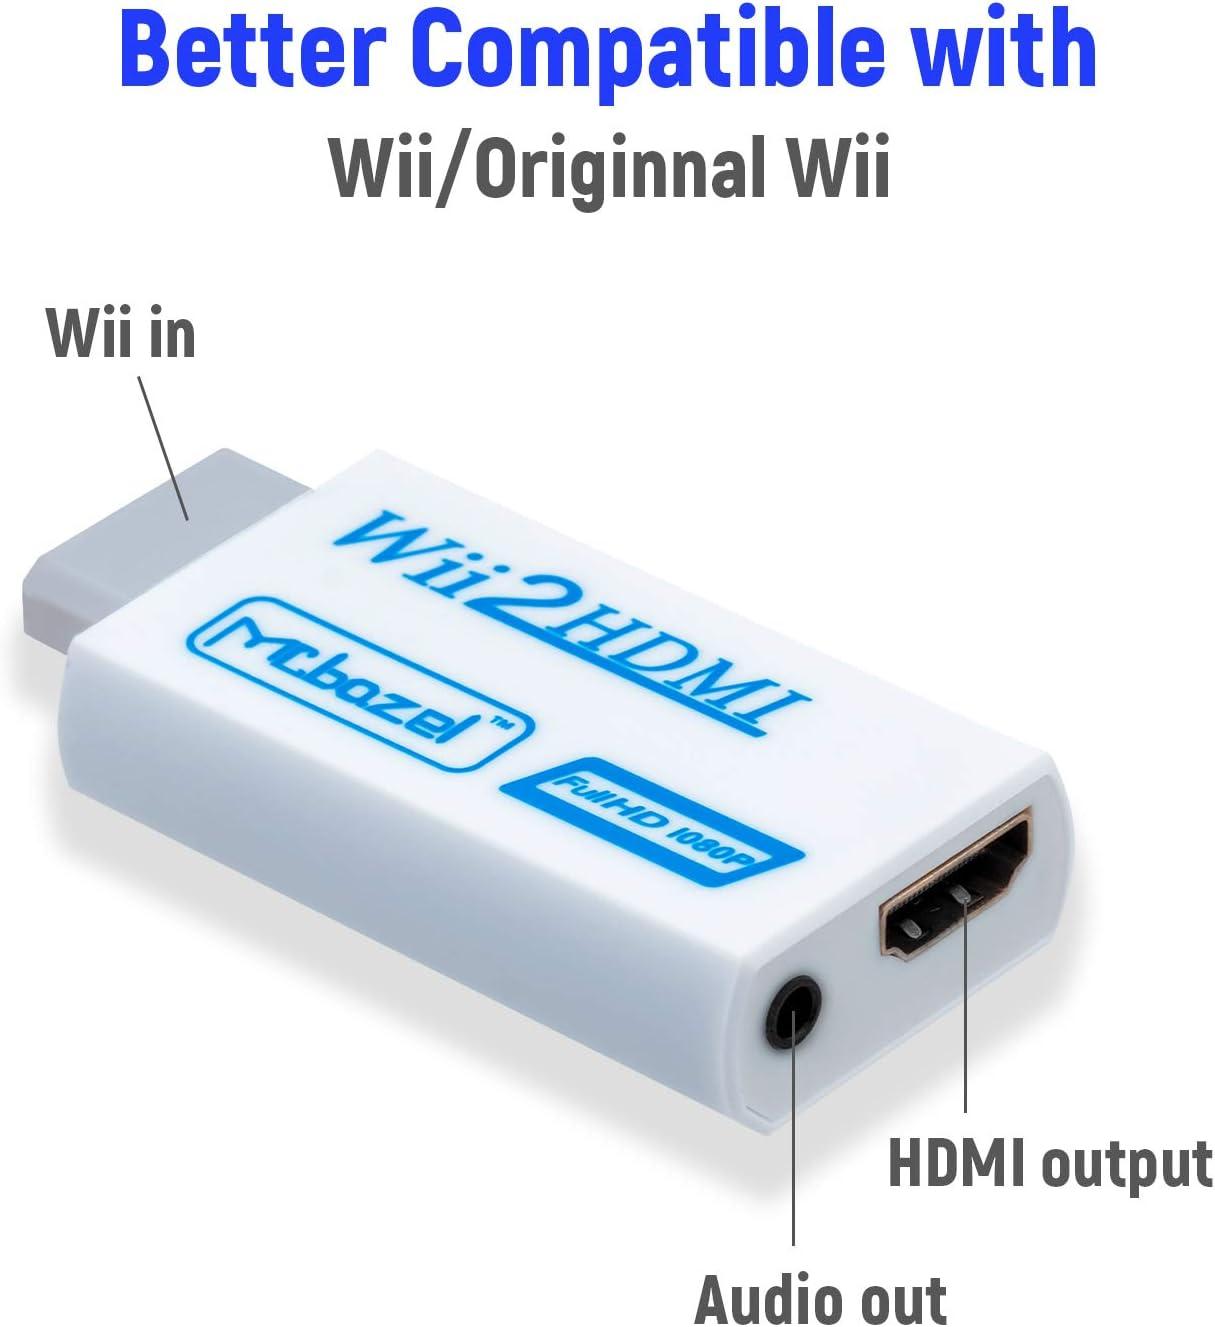 Mcbazel Wii a HDMI Converter, convertidor de Adaptador de Video Full HD 1080P con Audio de 3.5mm: Amazon.es: Electrónica